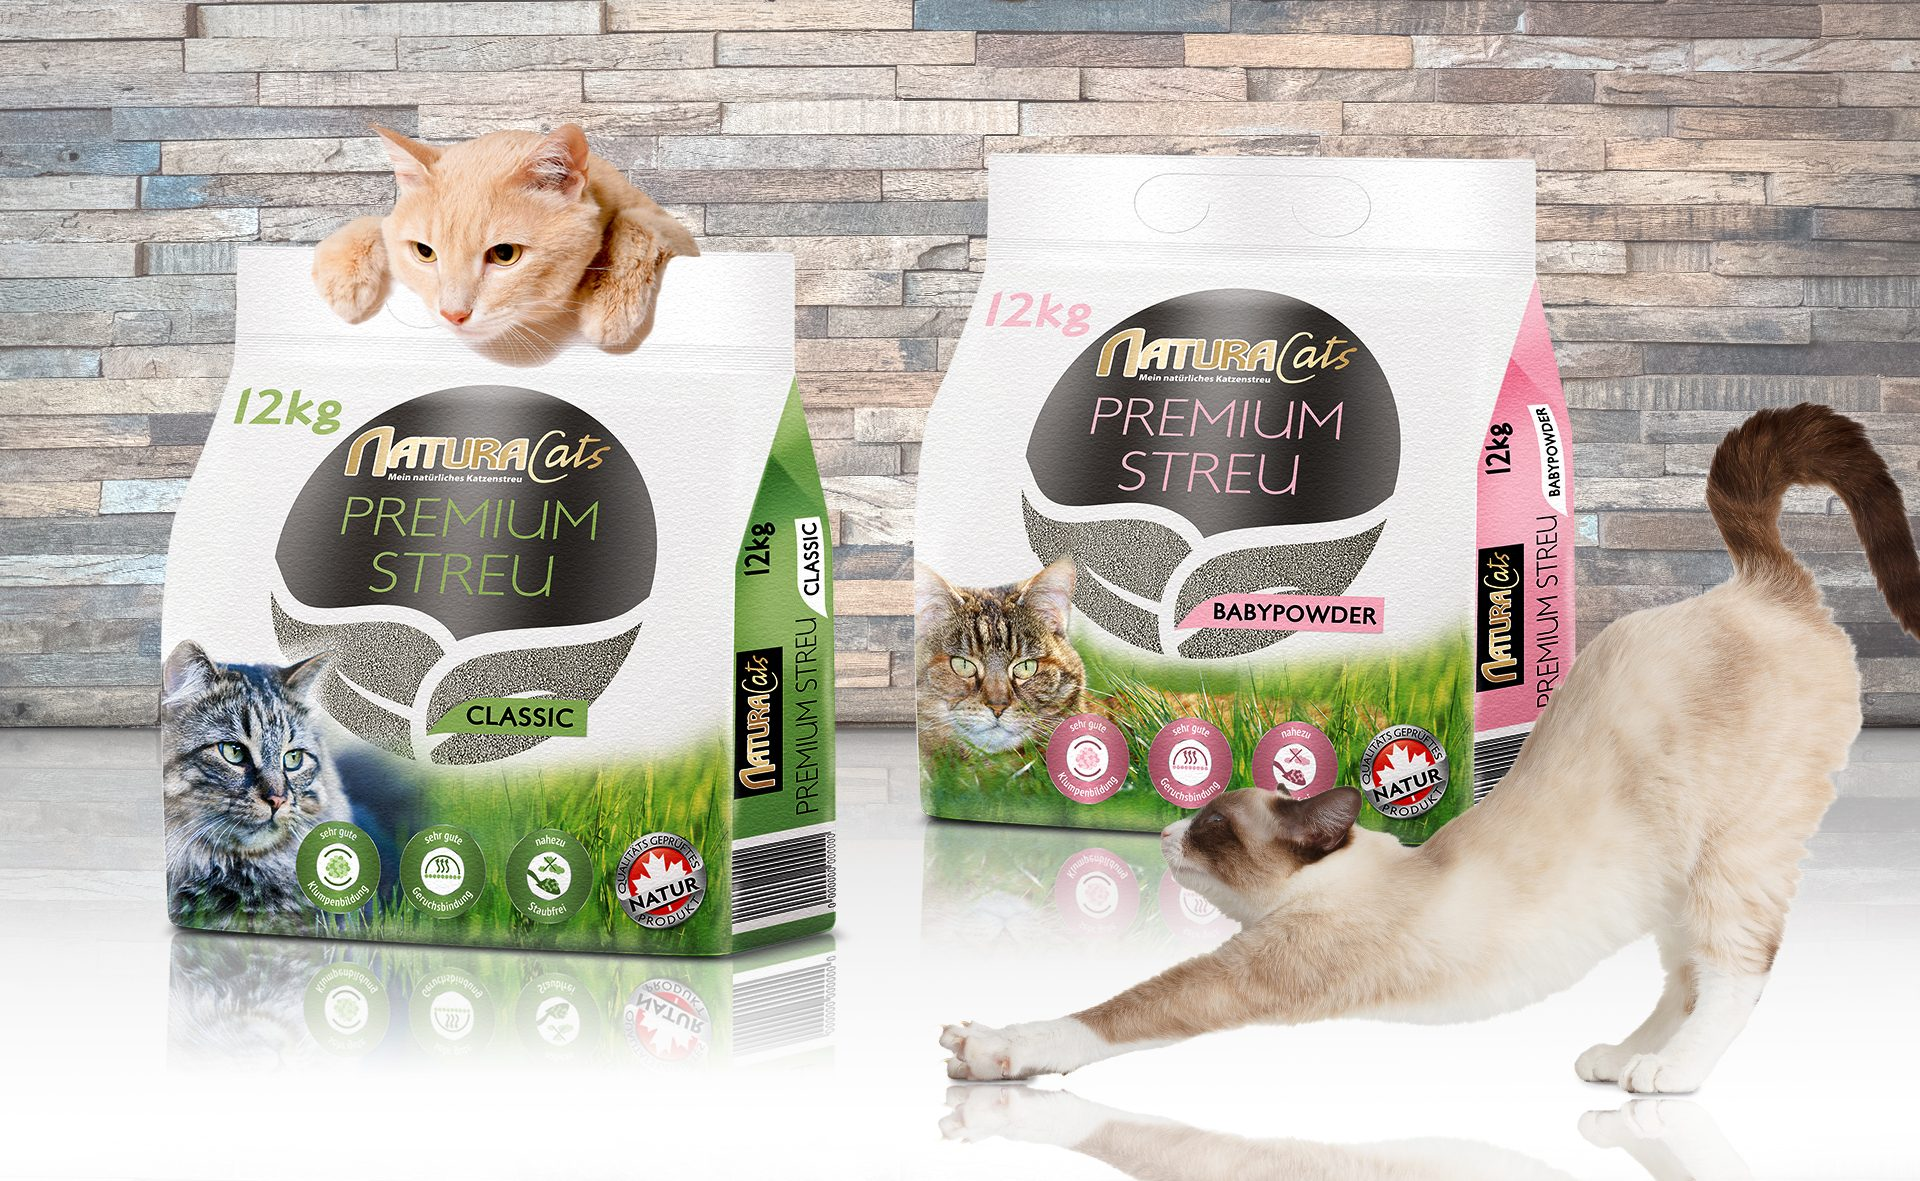 Verpackungsdesign Malvega - Referenz: Katzenstreu, Natura Cats